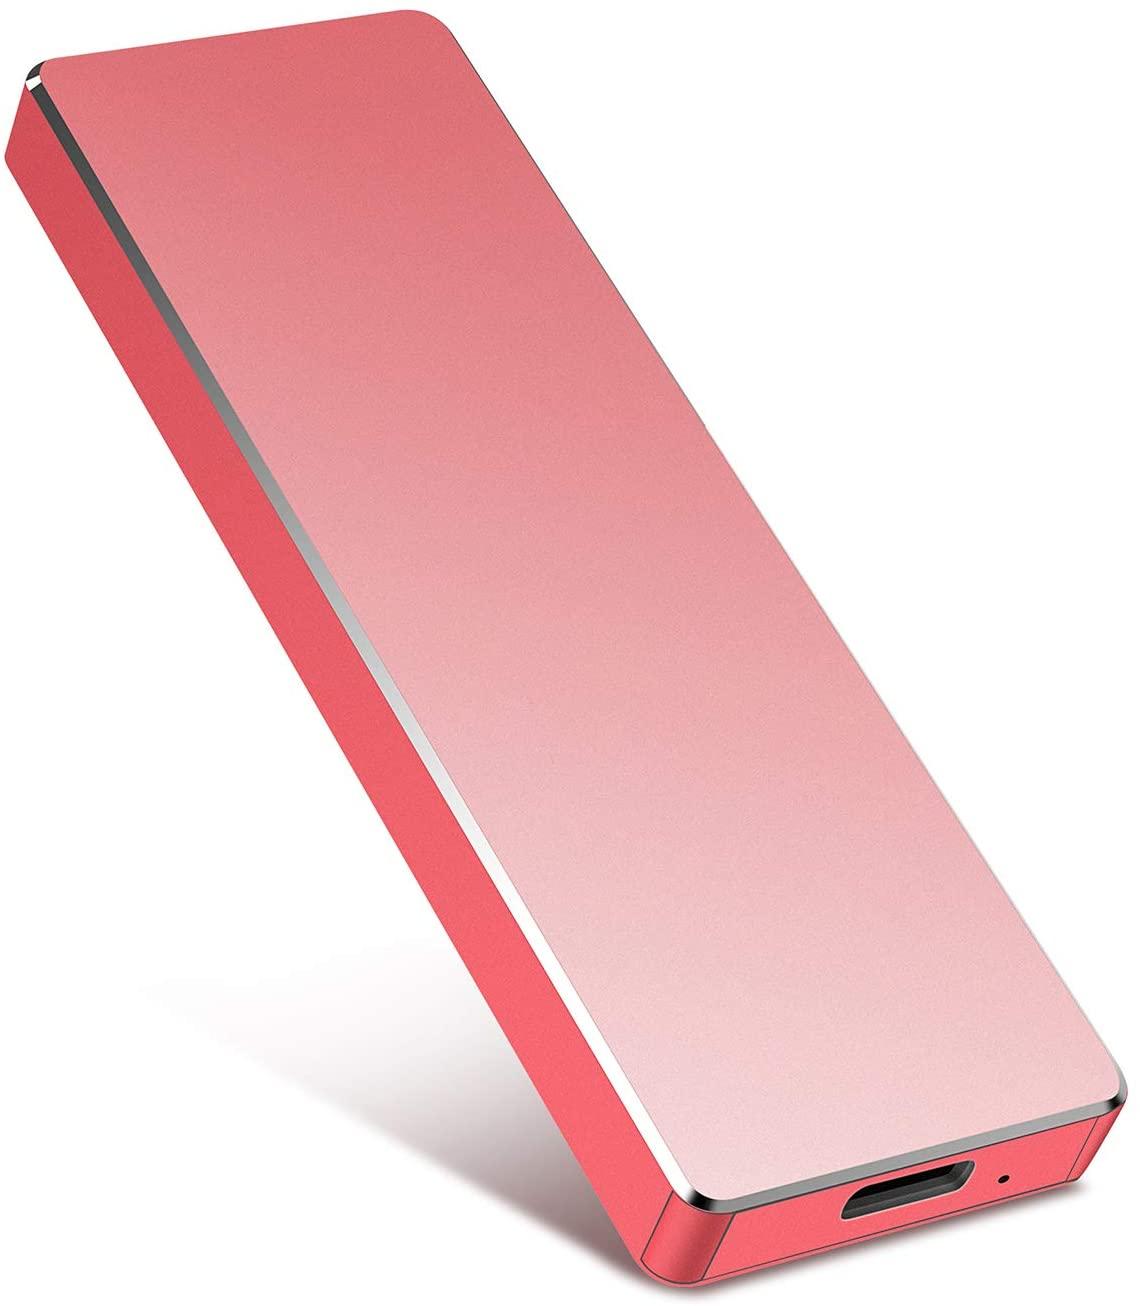 Portable 1TB 2TB External Hard Drive - Portable Hard Drive External USB3.1 Hard Drive for Mac,PC,Desktop,Laptop - Red,1TB